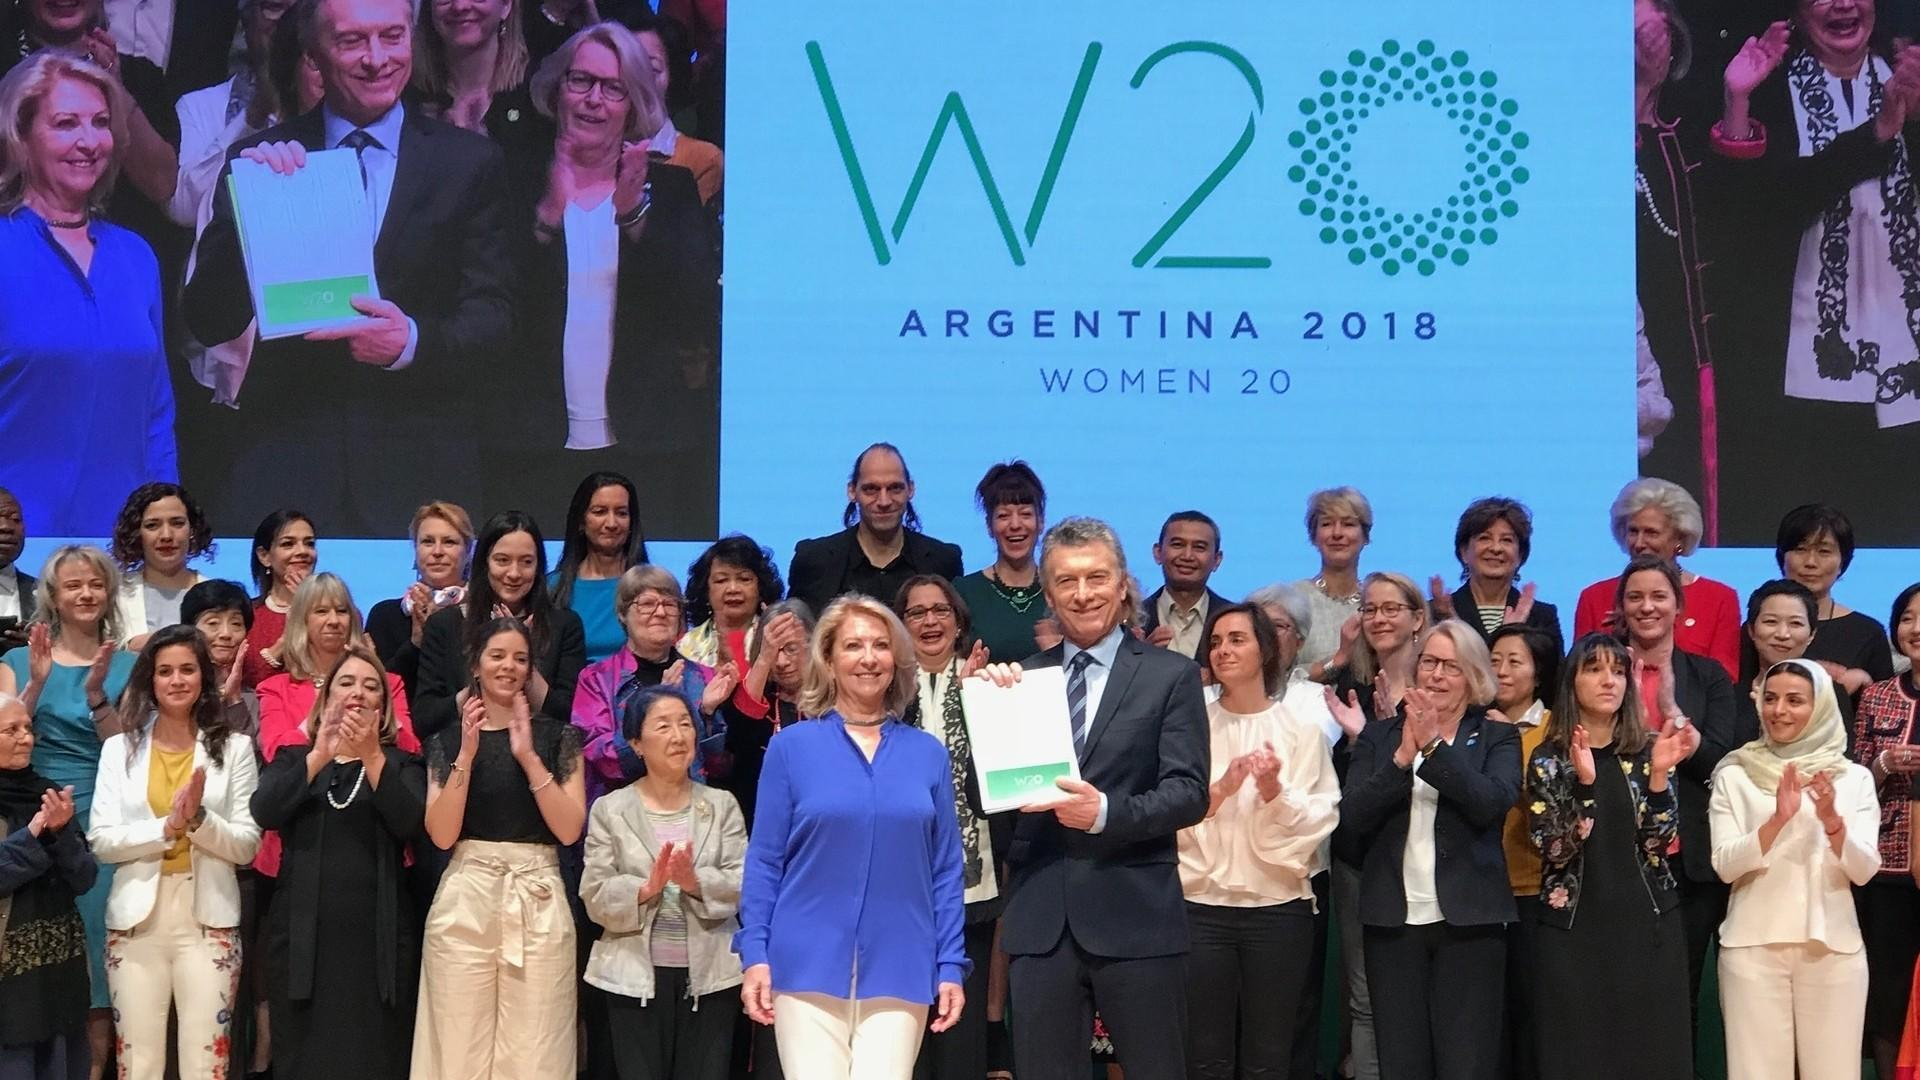 W20Argentina.jpg